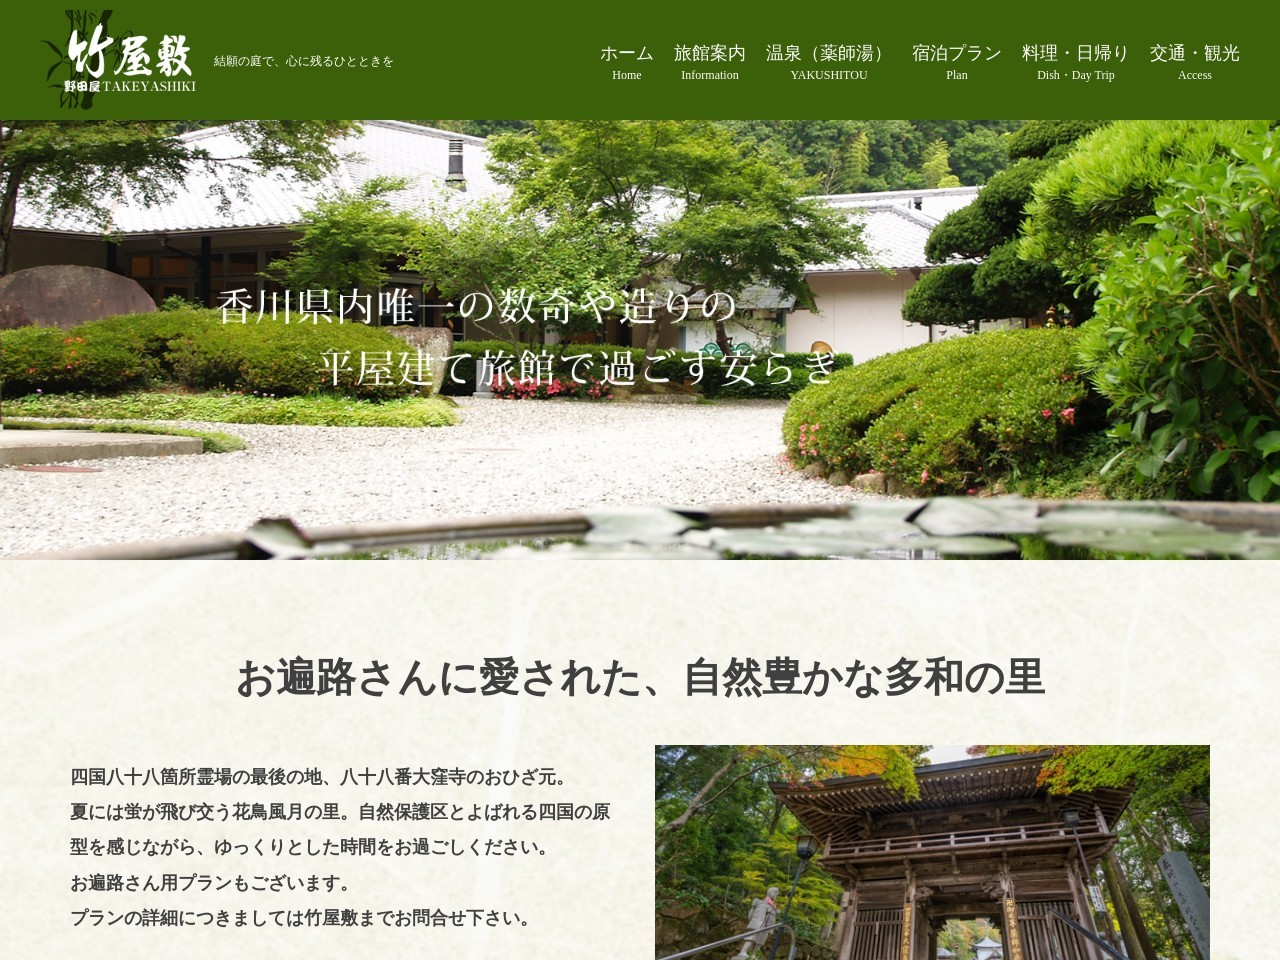 香川の自然湯豊かな旅館。八十八番大窪寺前 | 旅館 竹屋敷